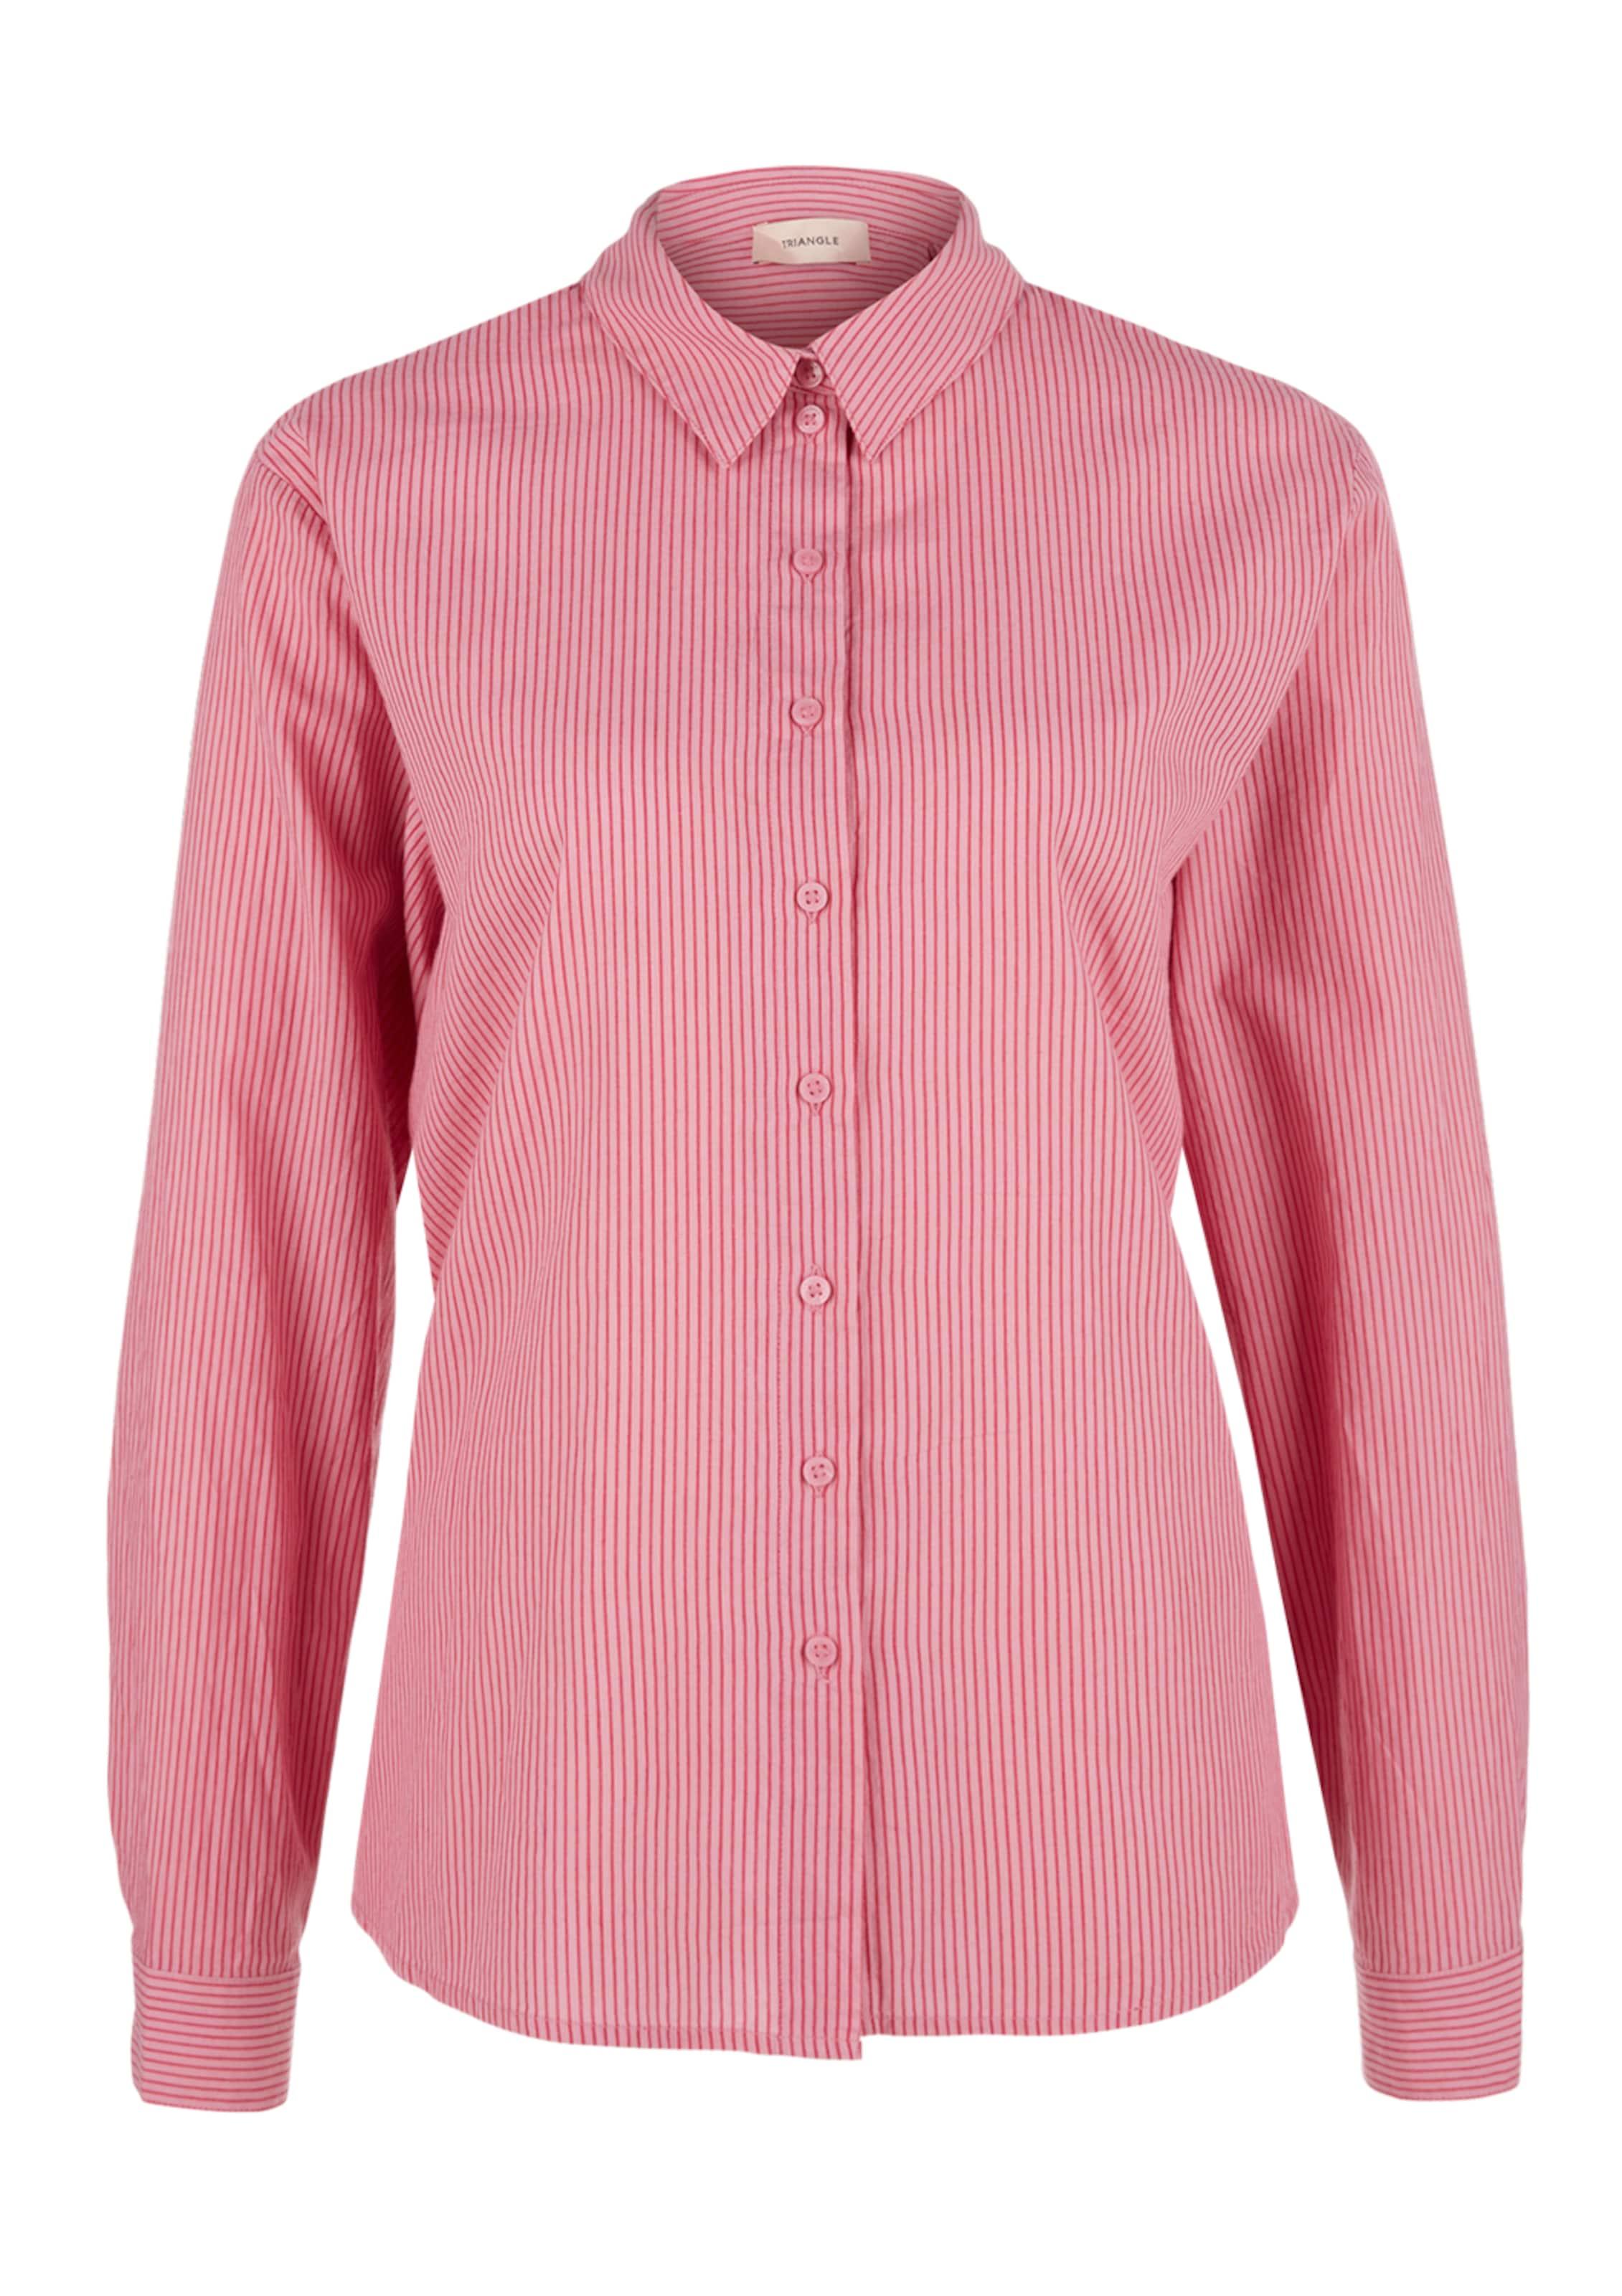 PinkHellpink Triangle Triangle In Bluse Bluse HYWI2D9E